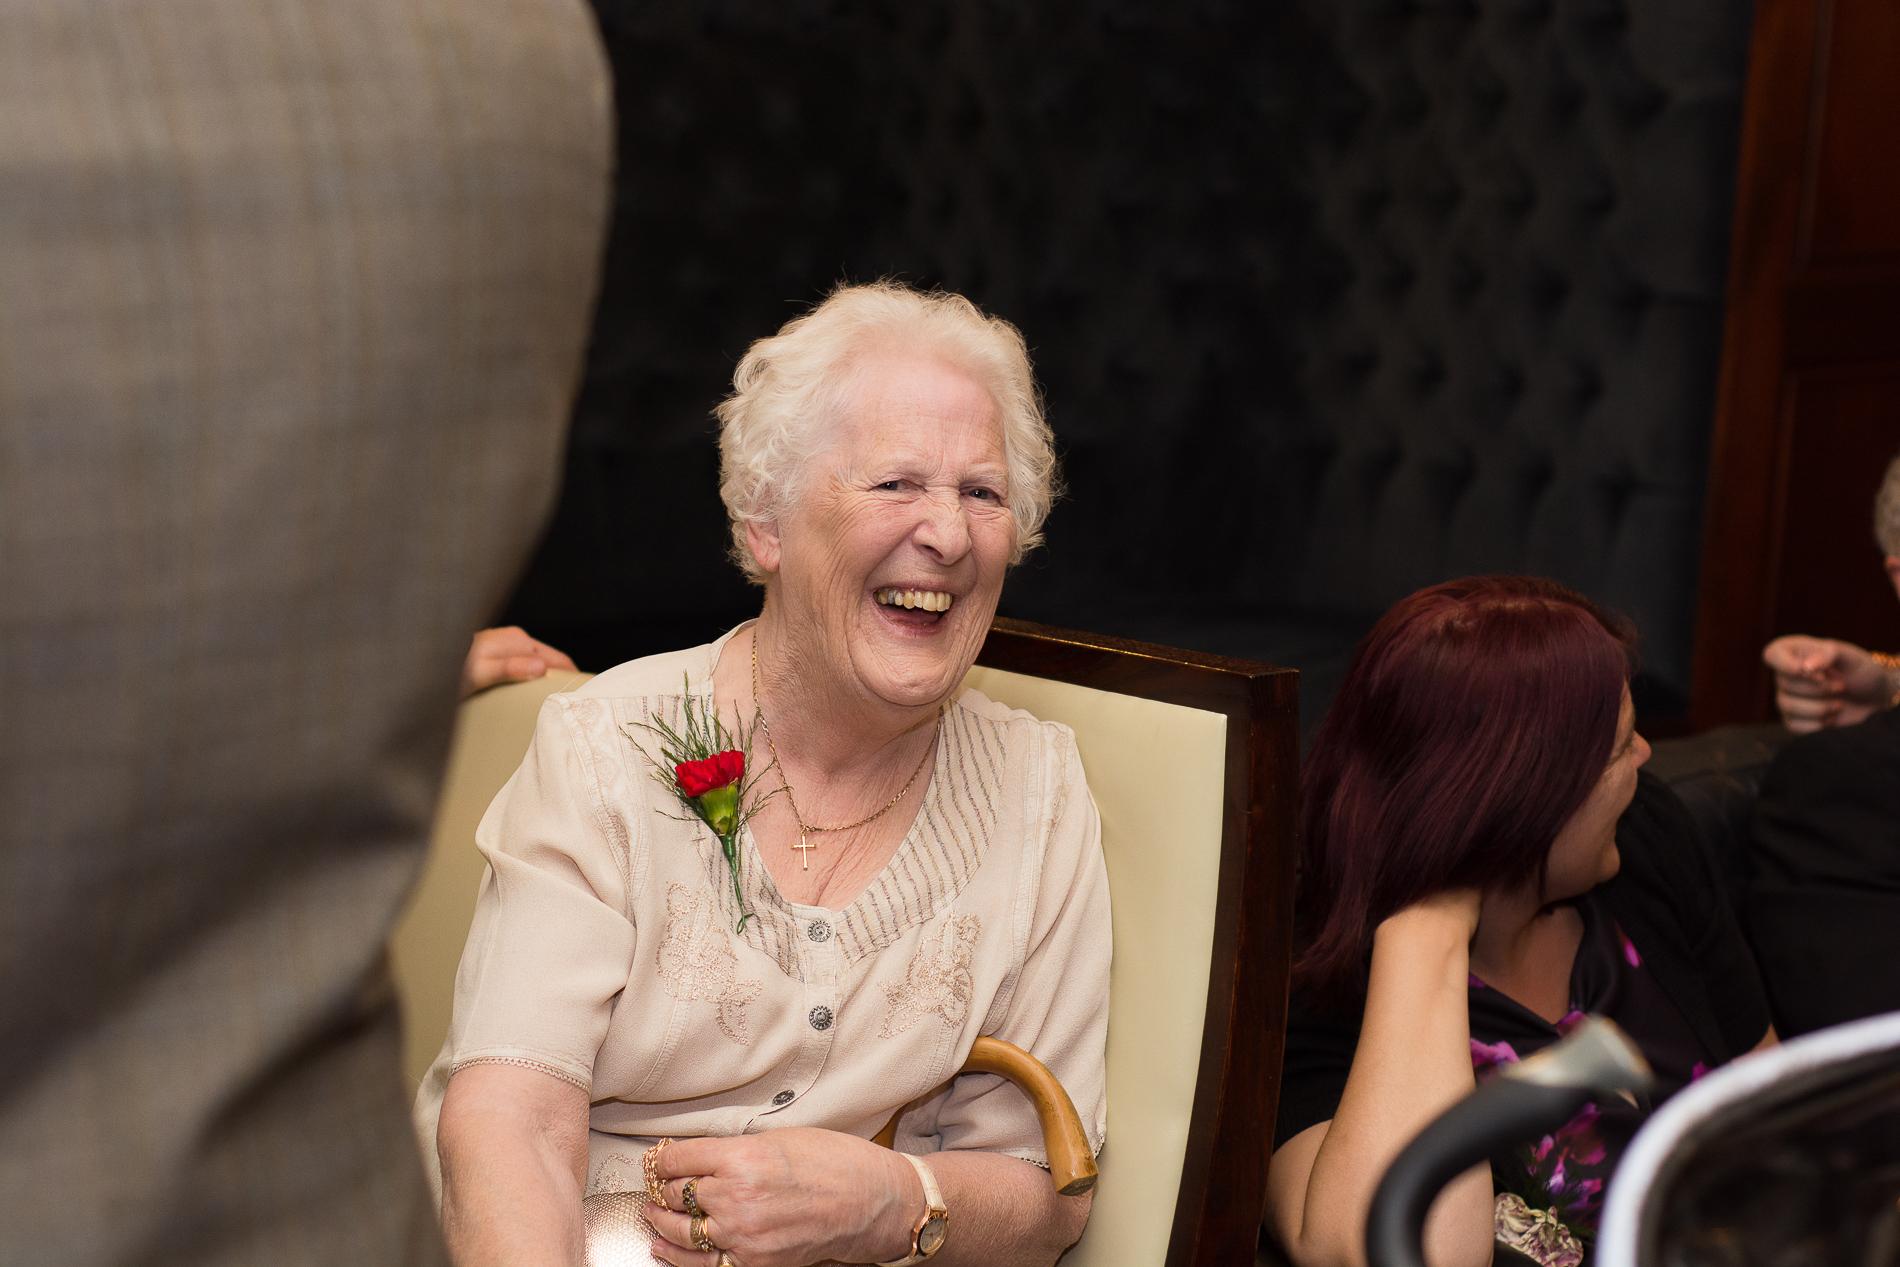 grandmas stunning smile at the atlantic hotel newquay